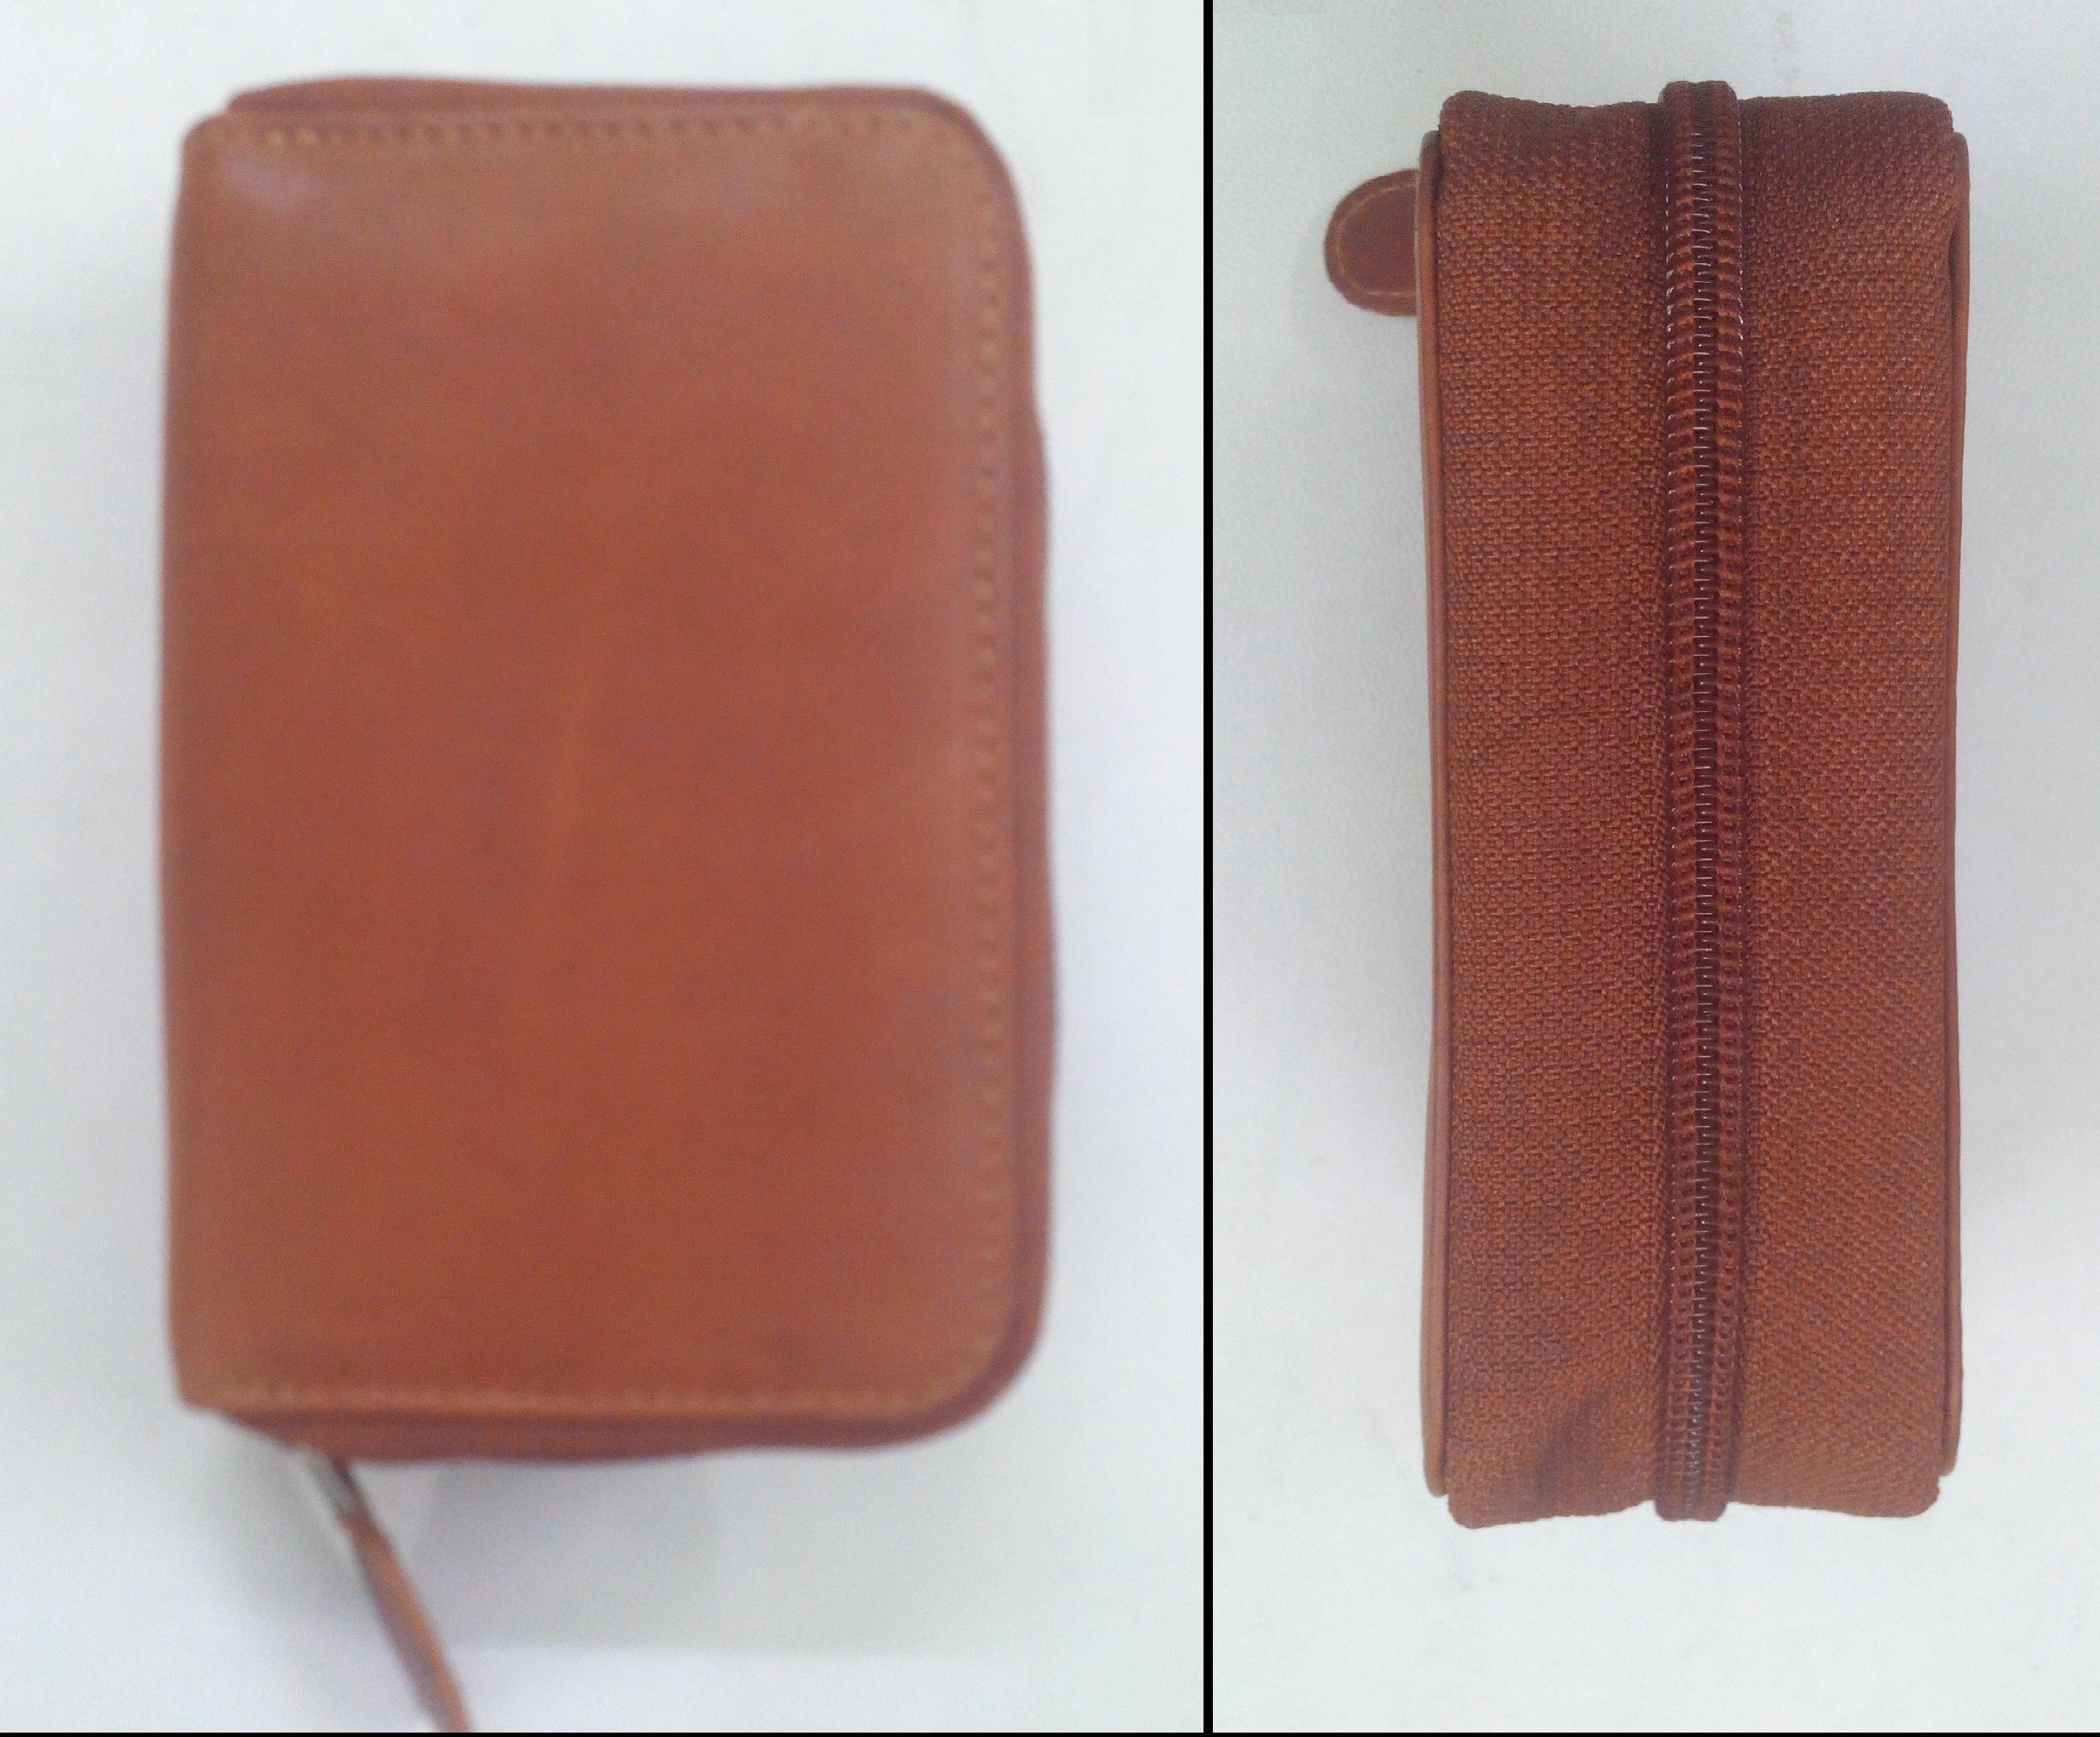 Multi card-holder